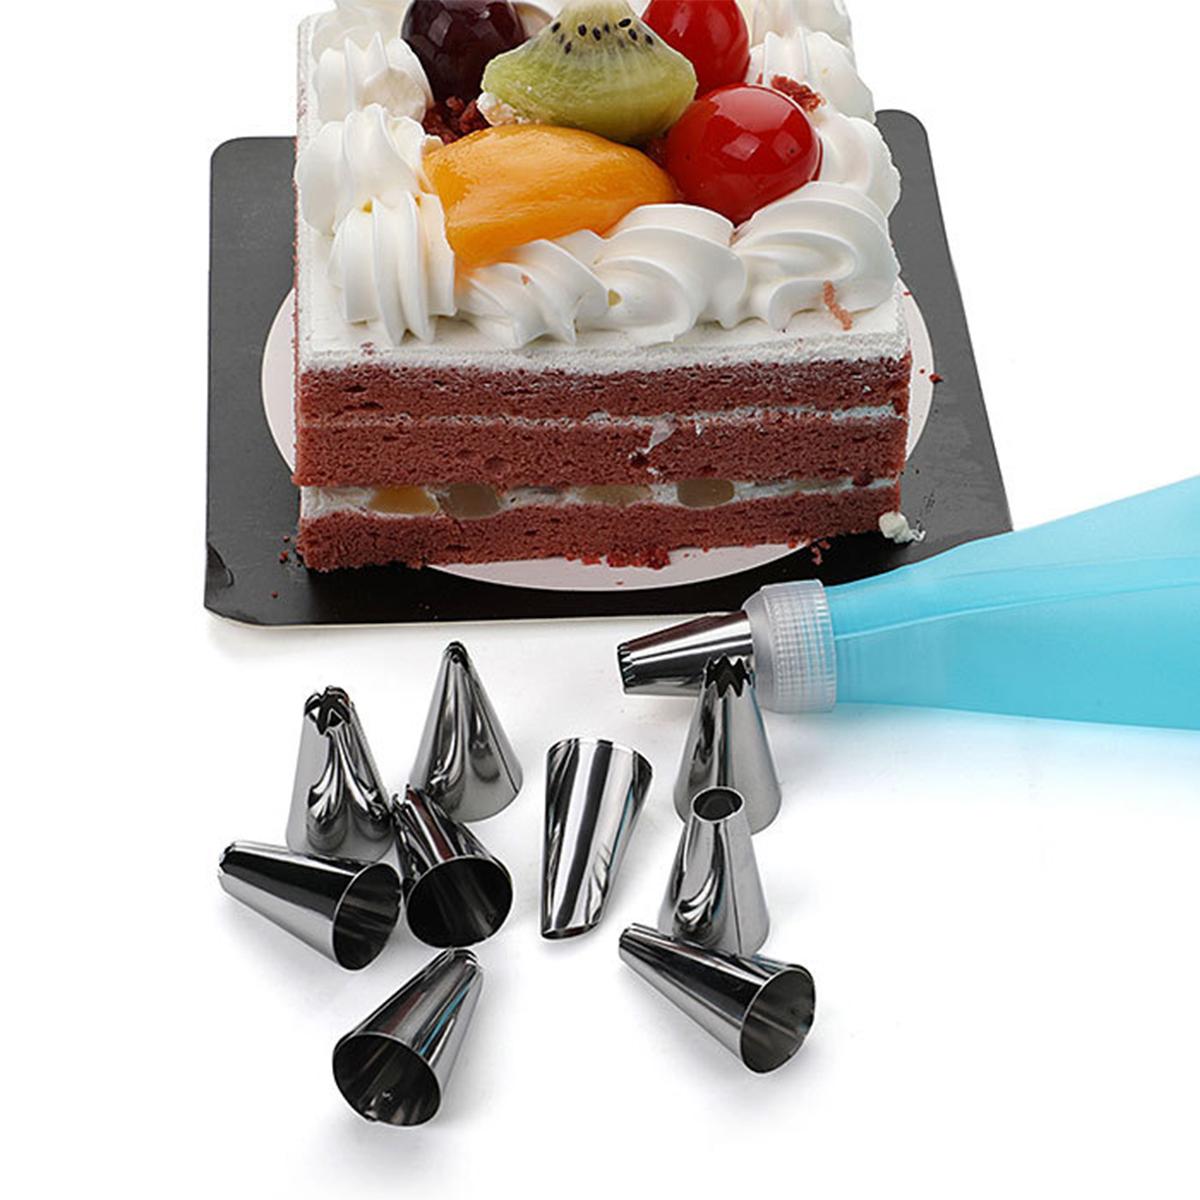 26pcs/50pcs Professional Cake Decorating Supplies Set ...